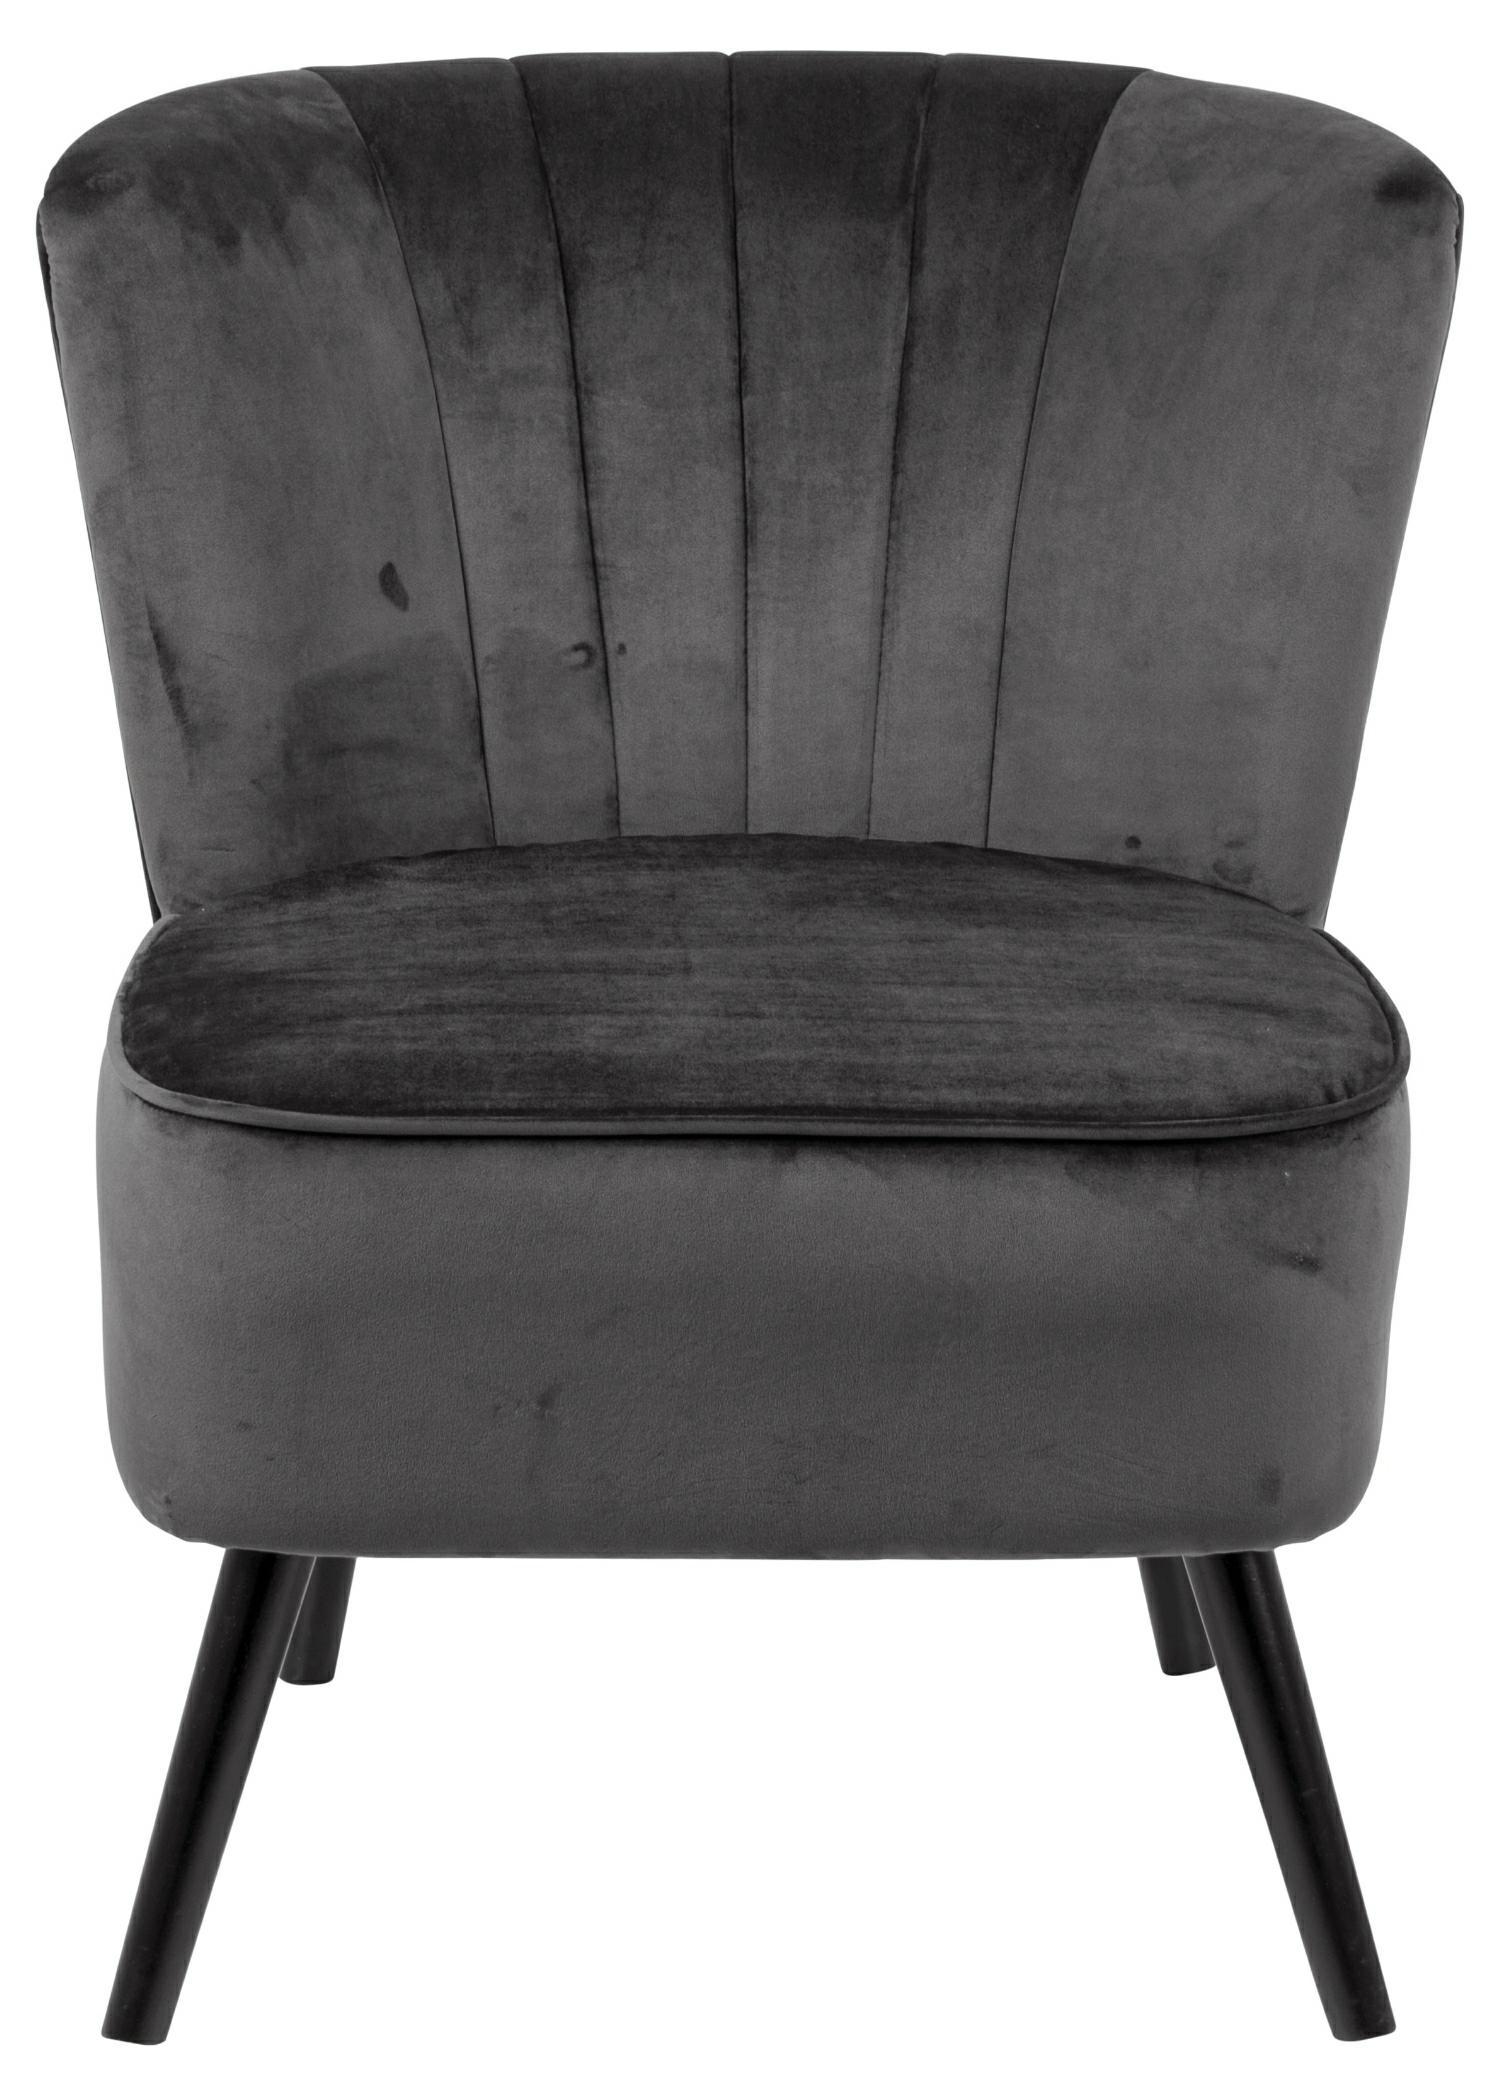 Fotel Lark VIC ciemny szary - zdjęcie nr 2